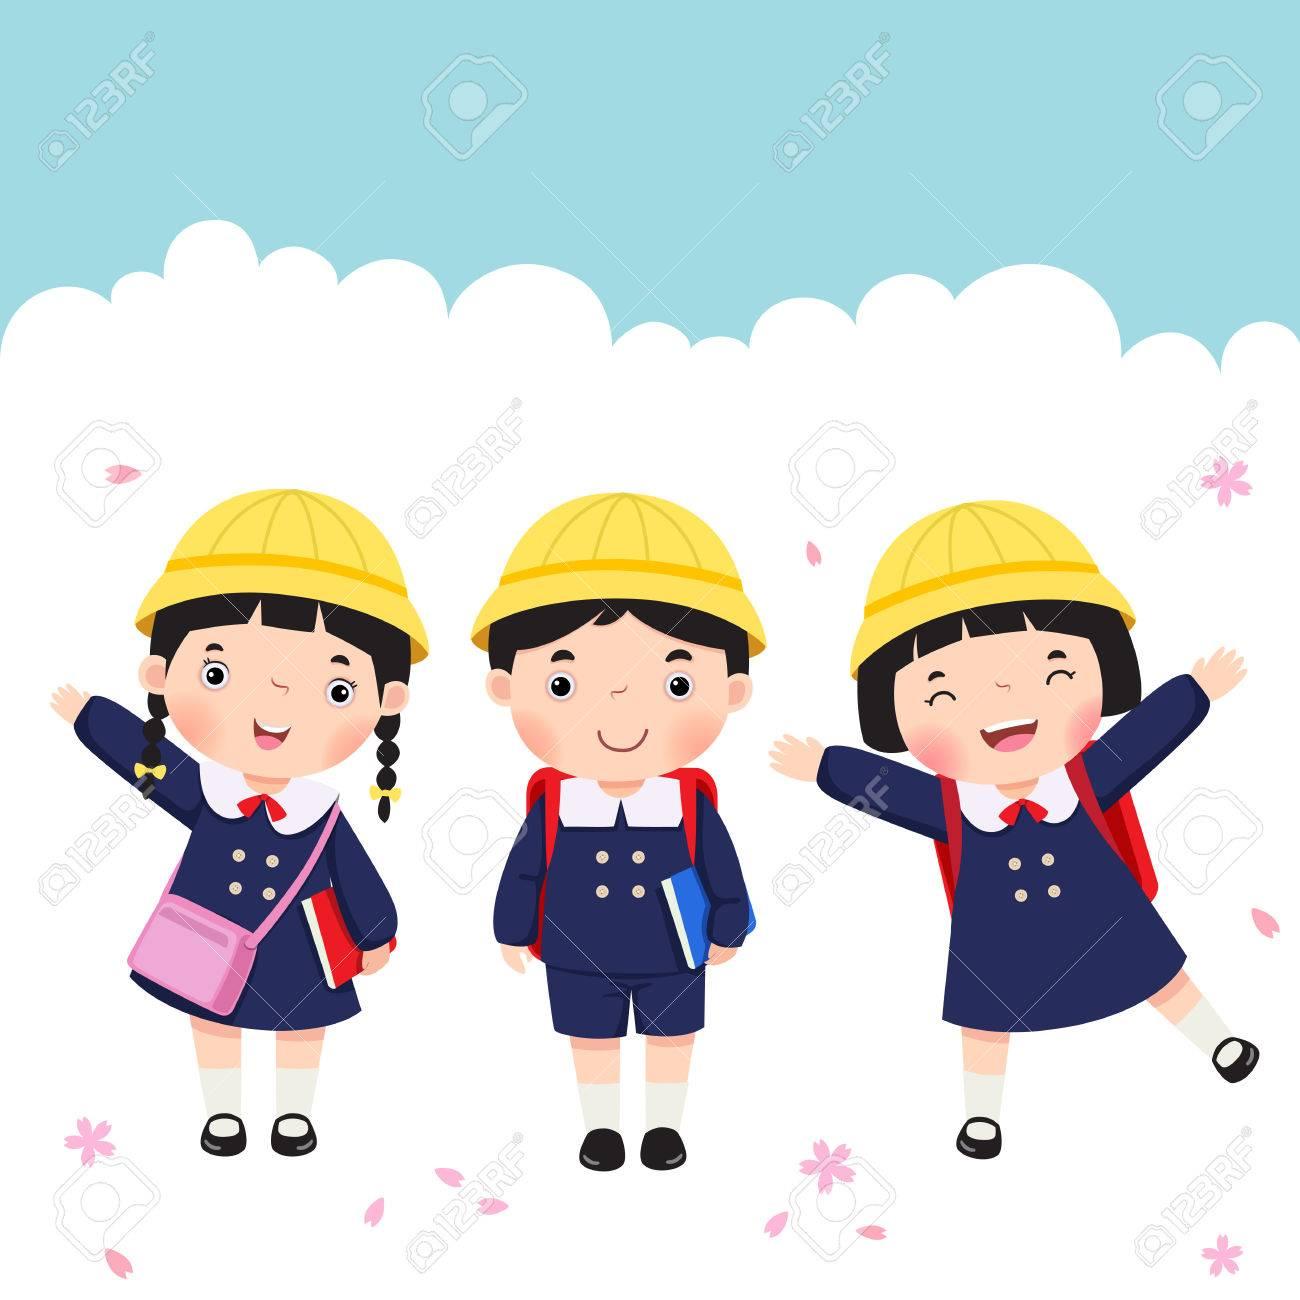 Vector illustration of Japanese student in school uniform going to school - 56089298